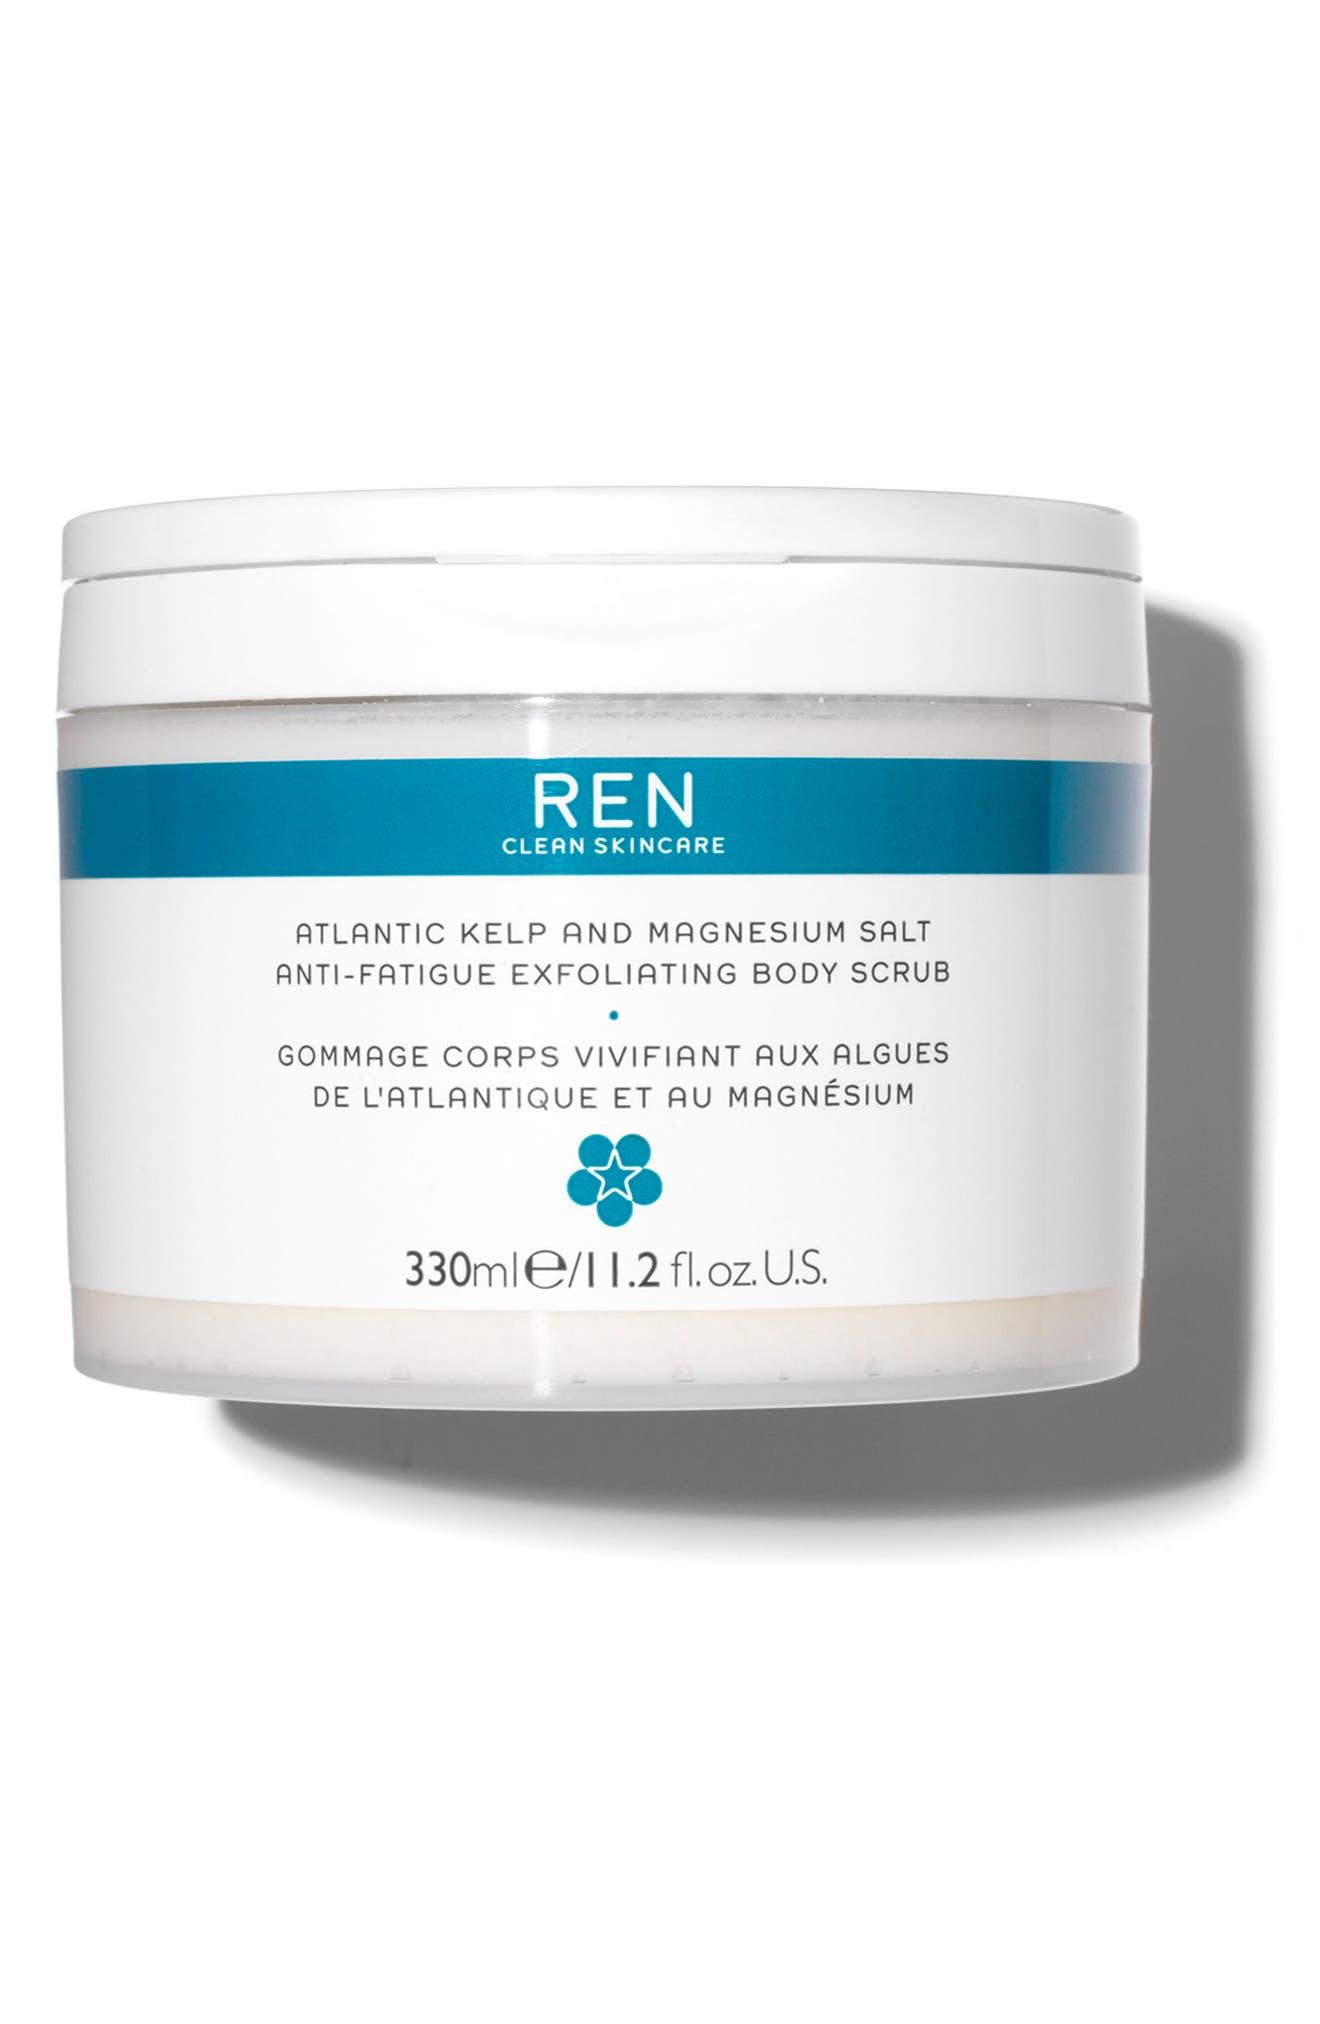 SPACE.NK.apothecary REN Atlantic Kelp and Magnesium Salt Anti-Fatigue Exfoliating Body Scrub,                         Main,                         color, No Color